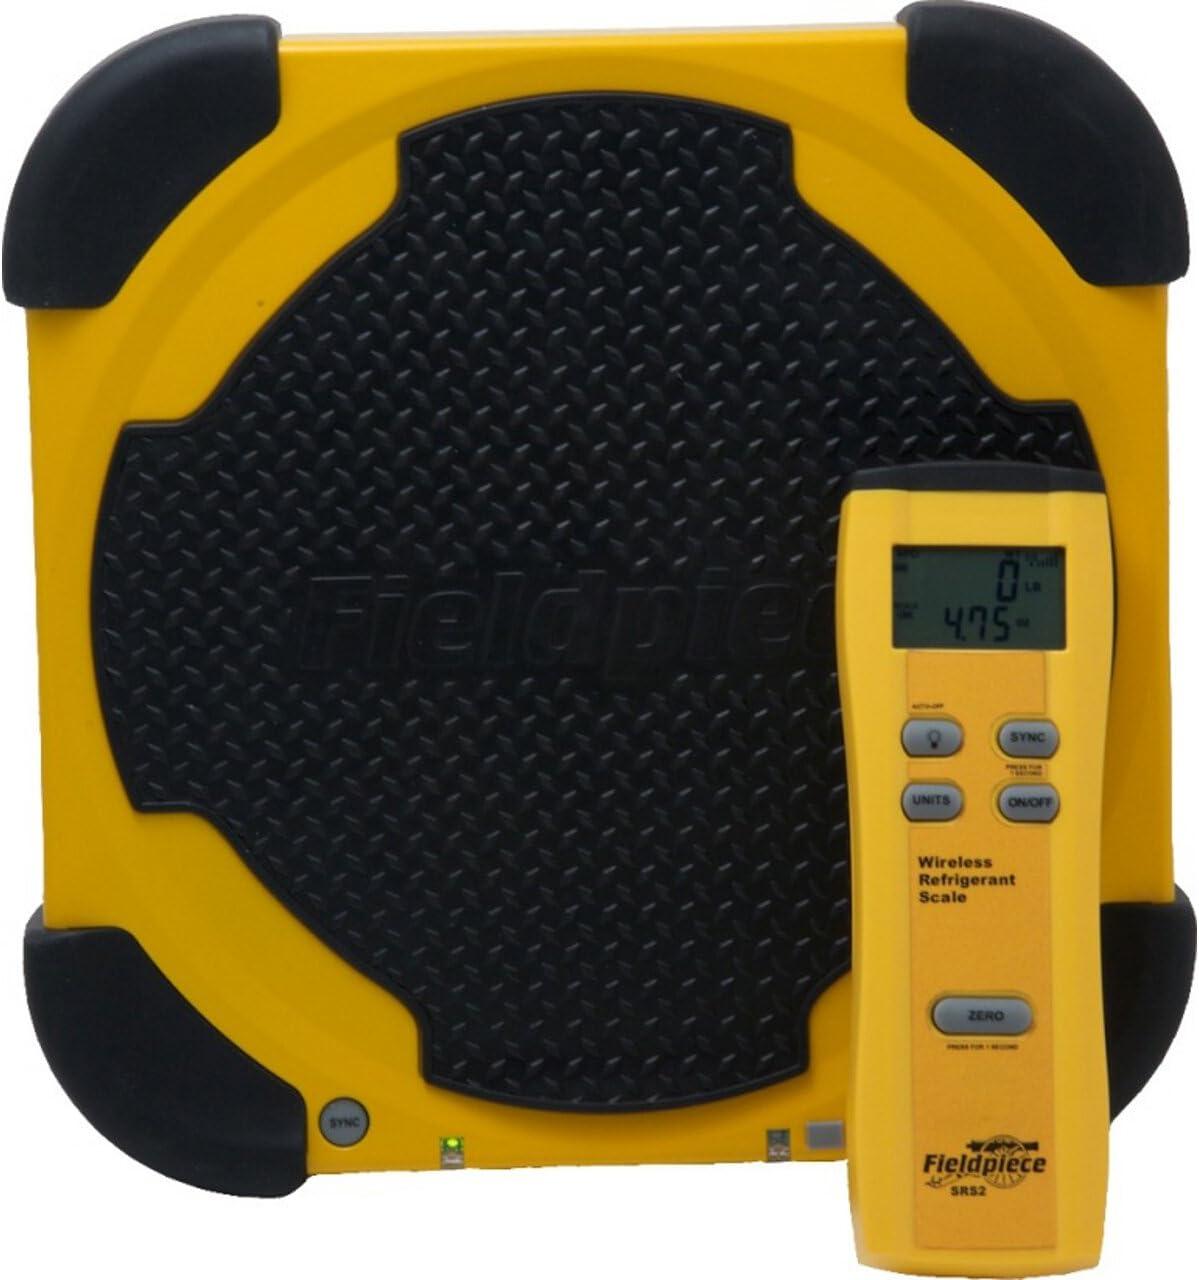 Fieldpiece SRS2C Wireless Refrigerant Scale